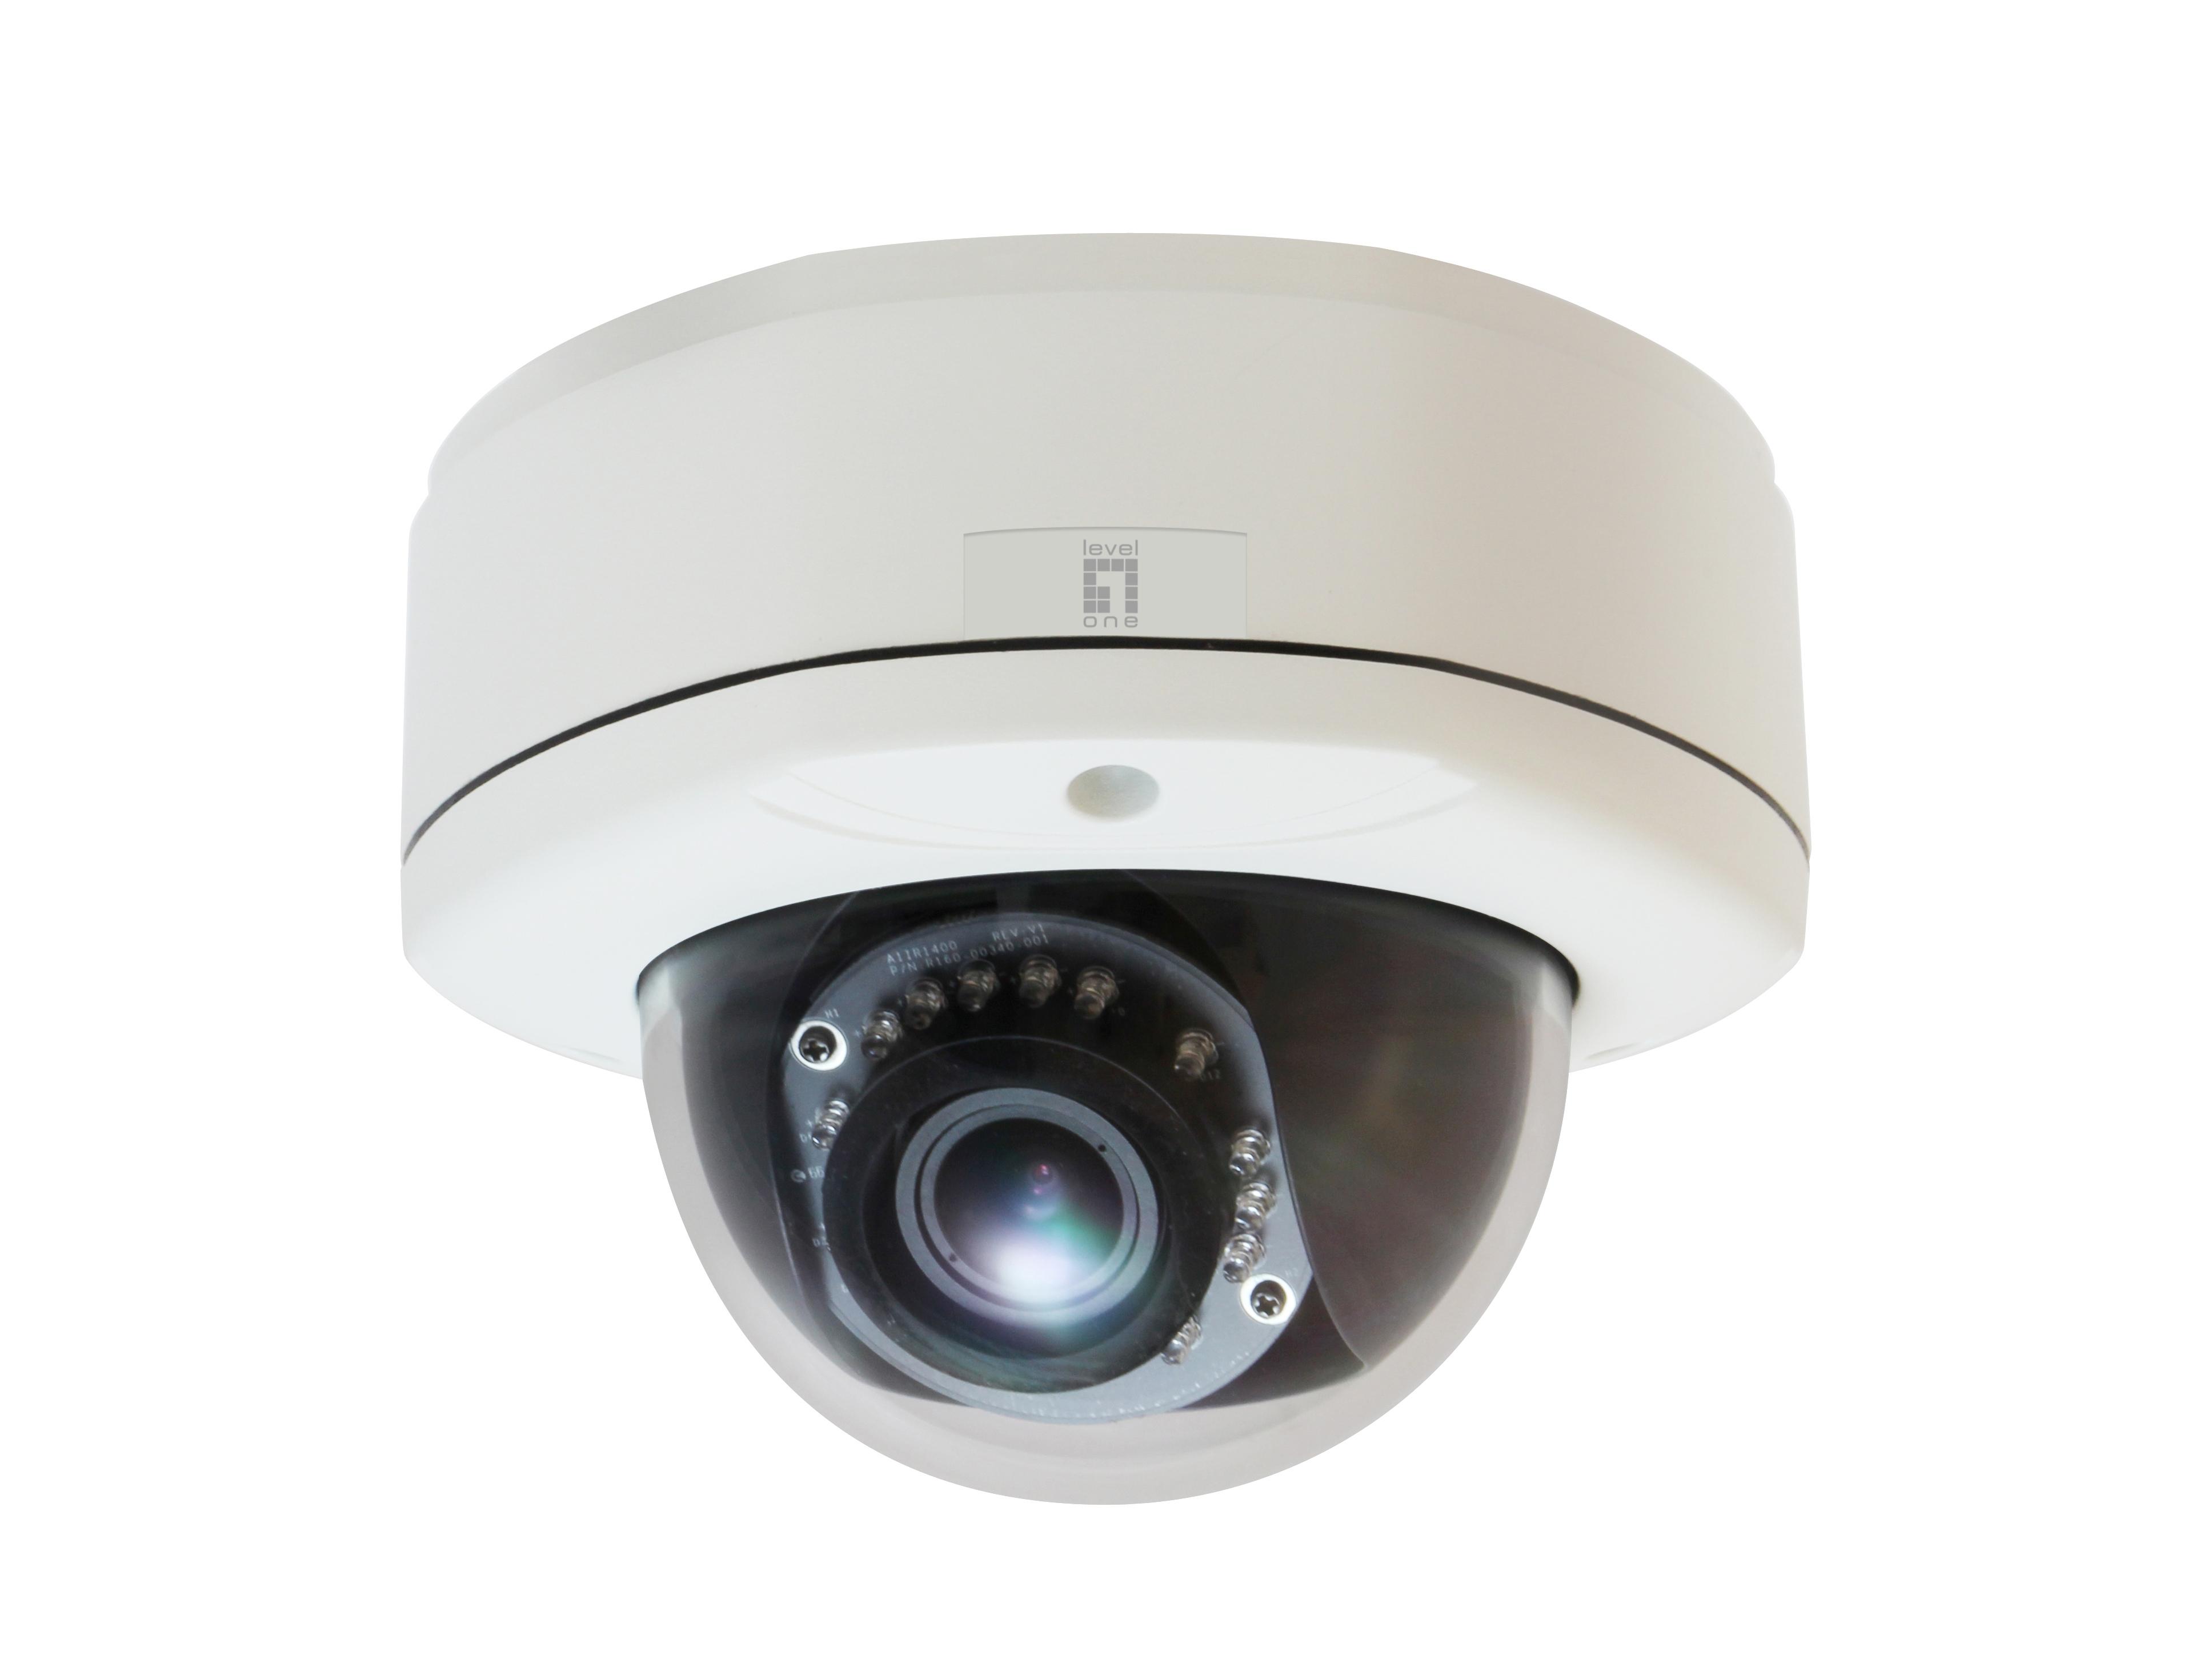 LevelOne FCS-3055 IP security camera Outdoor Kuppel Schwarz - Weiß